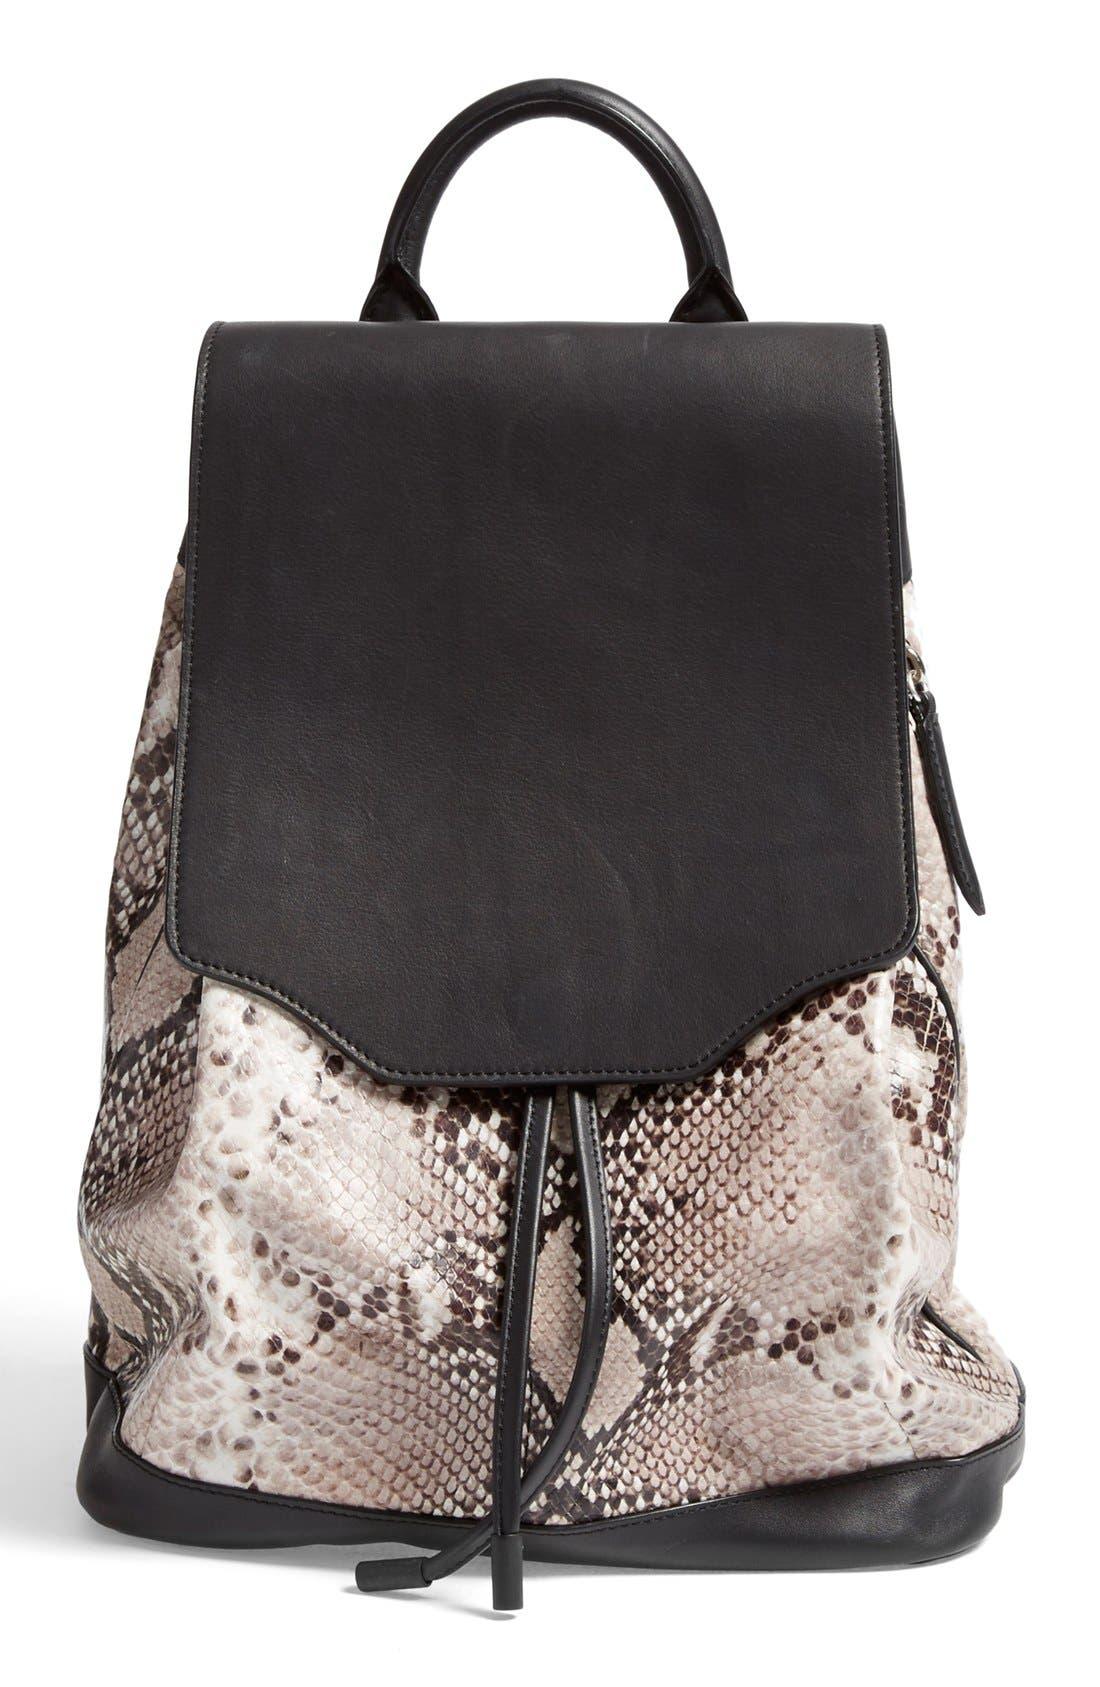 Alternate Image 1 Selected - rag & bone 'Pilot' Snake Embossed Leather Backpack